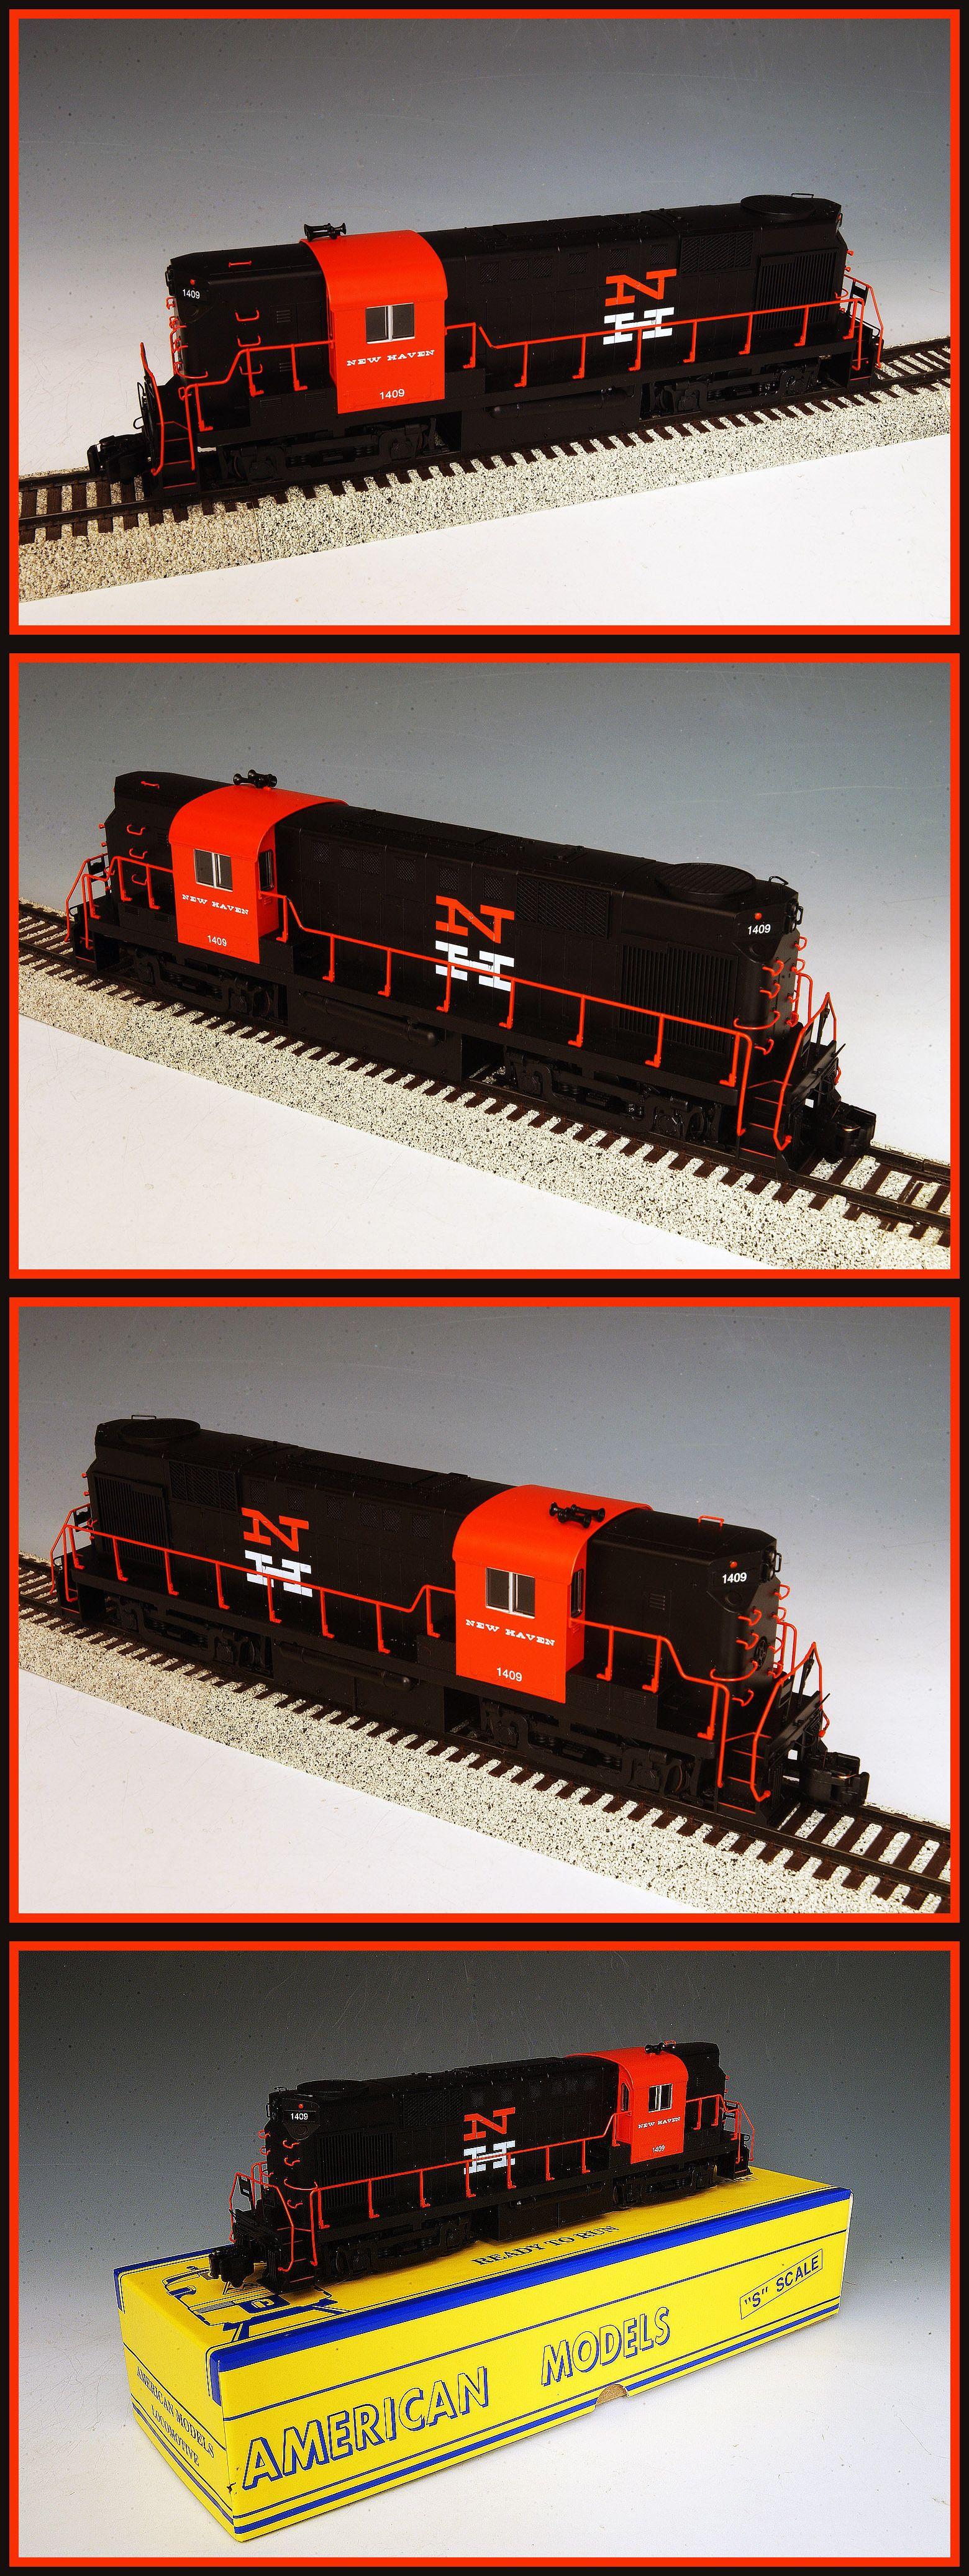 Locomotives american model ac hirail new haven rr dx